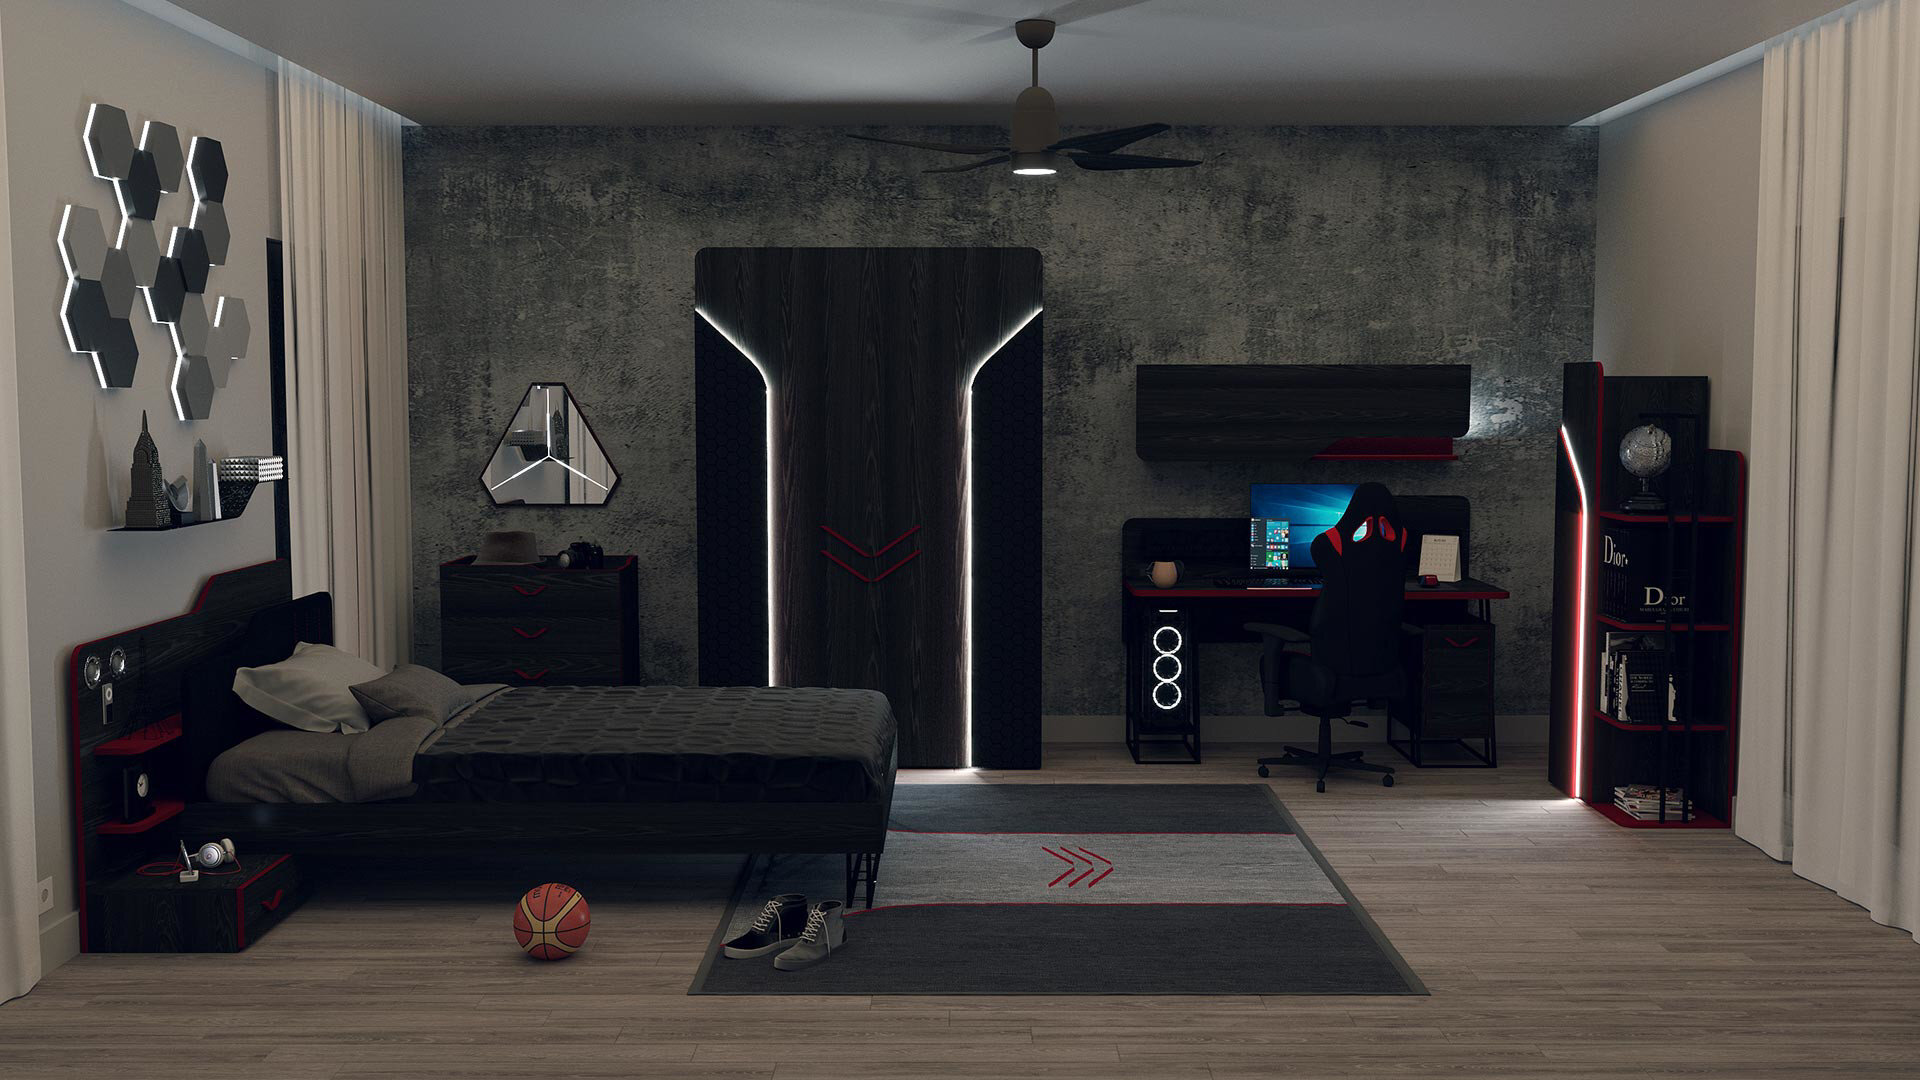 Gamer 120 Bedstead Casing